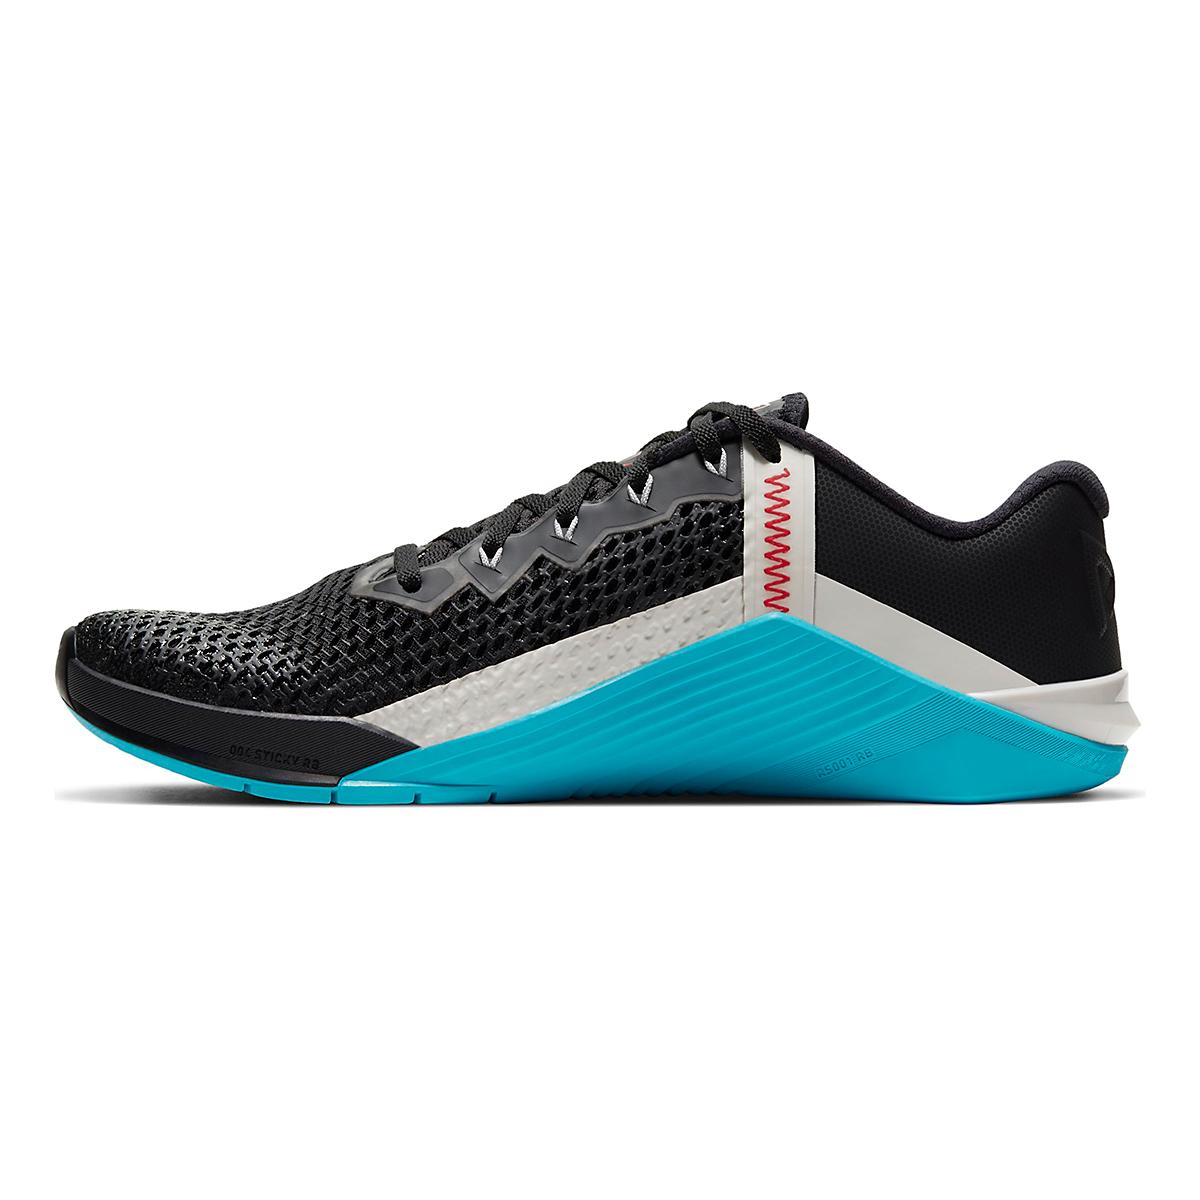 Men's Nike Metcon 6 Training Shoes - Color: Black/University Red/Light Blue Fury - Size: 5 - Width: Regular, Black/University Red/Light Blue Fury, large, image 2